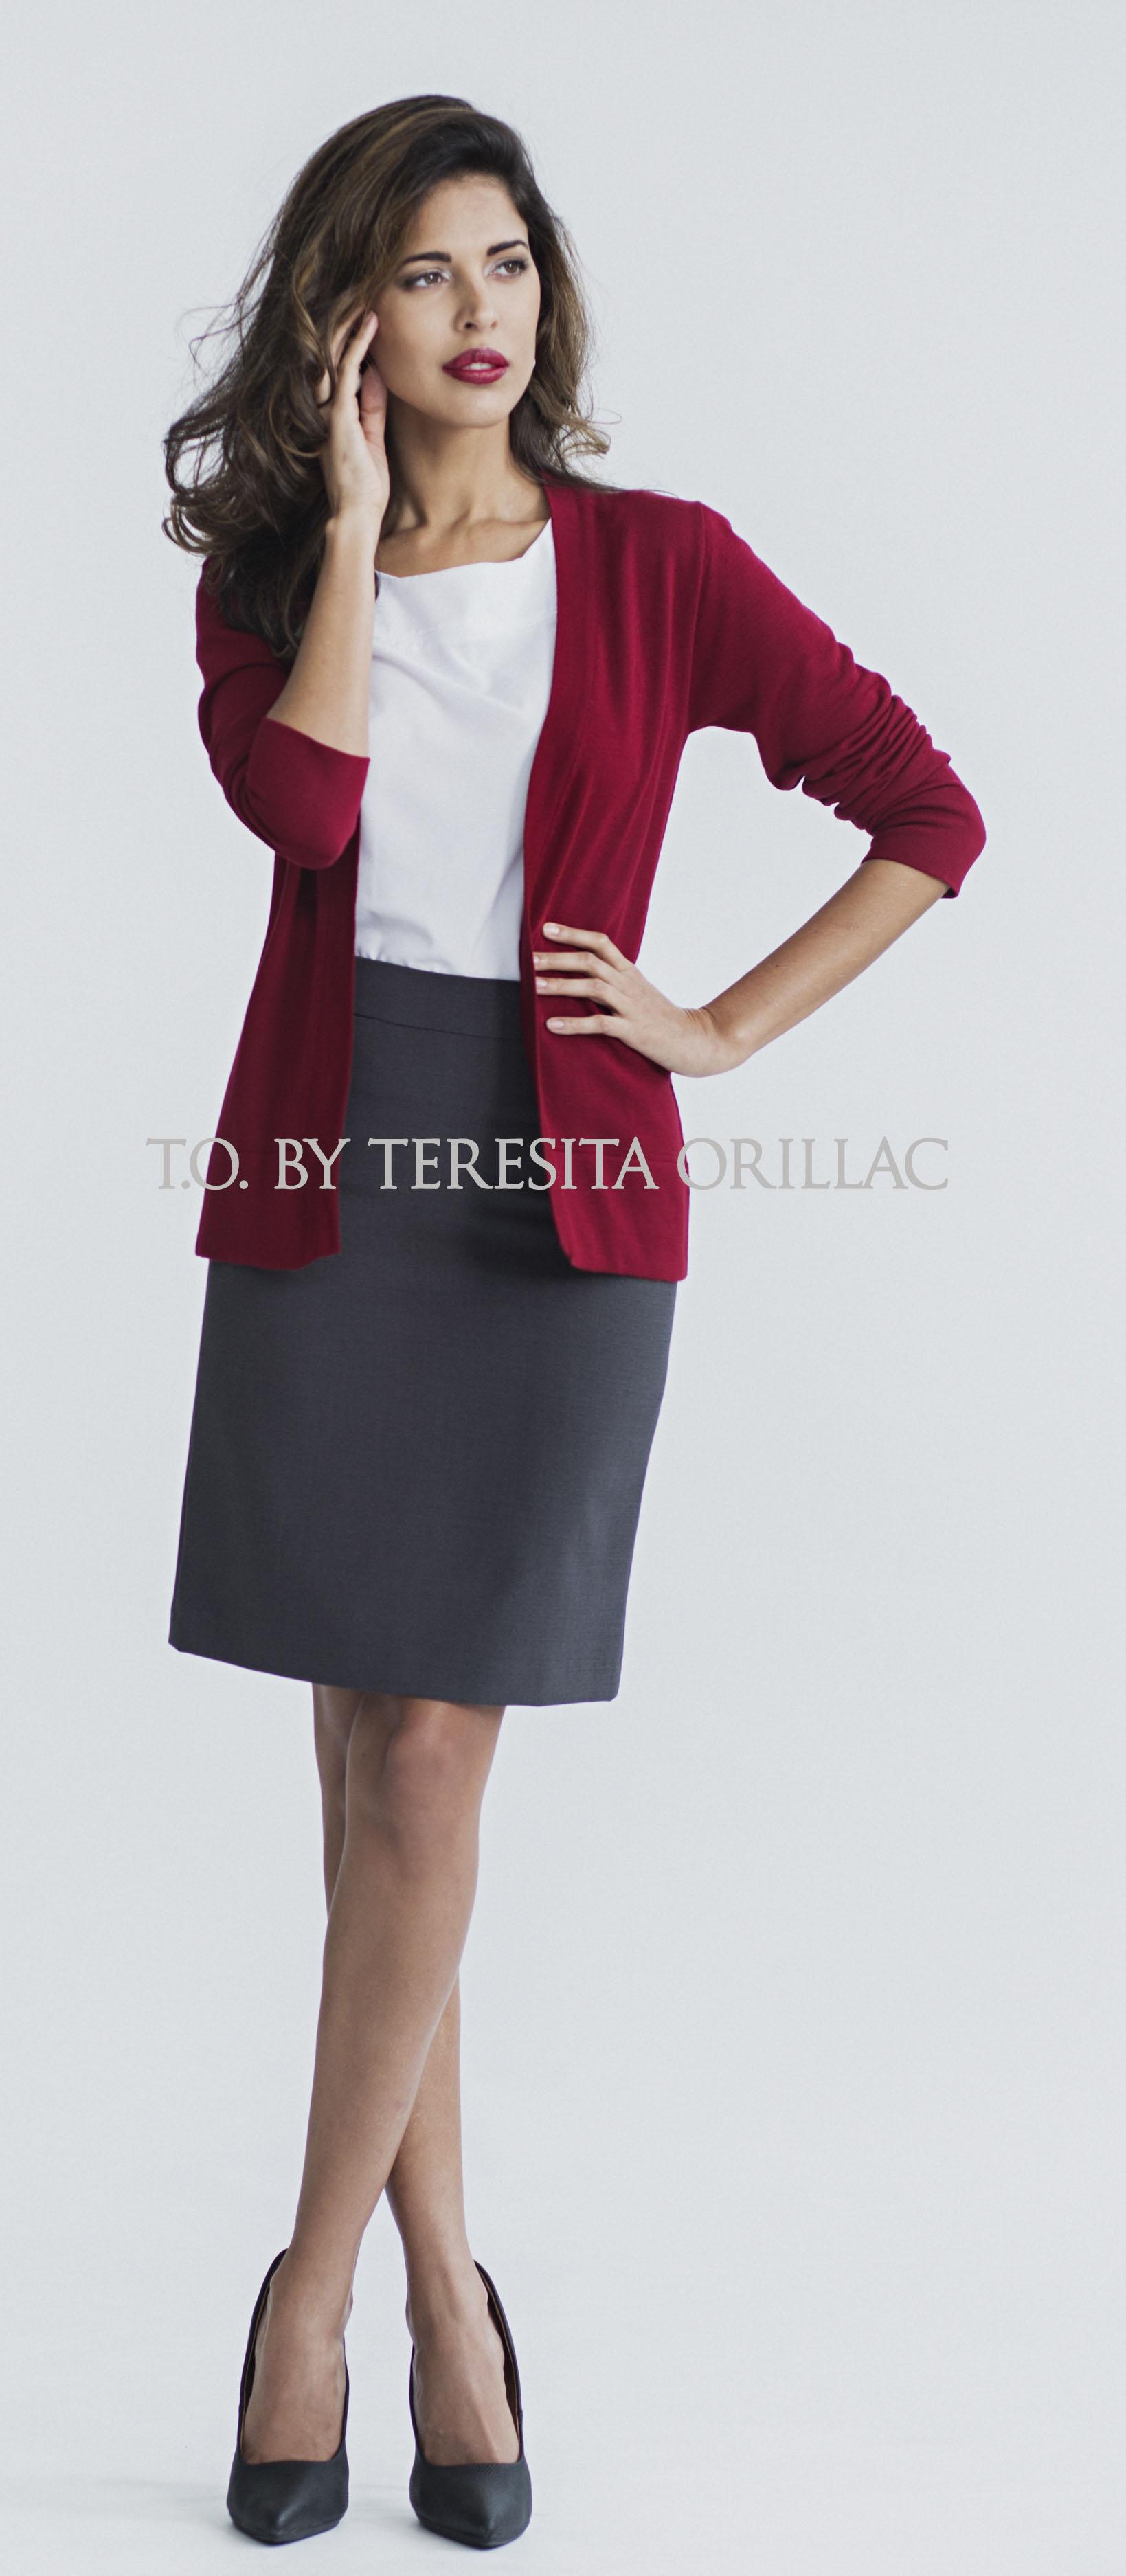 Uniformes panama ropa ejecutiva 11.jpg